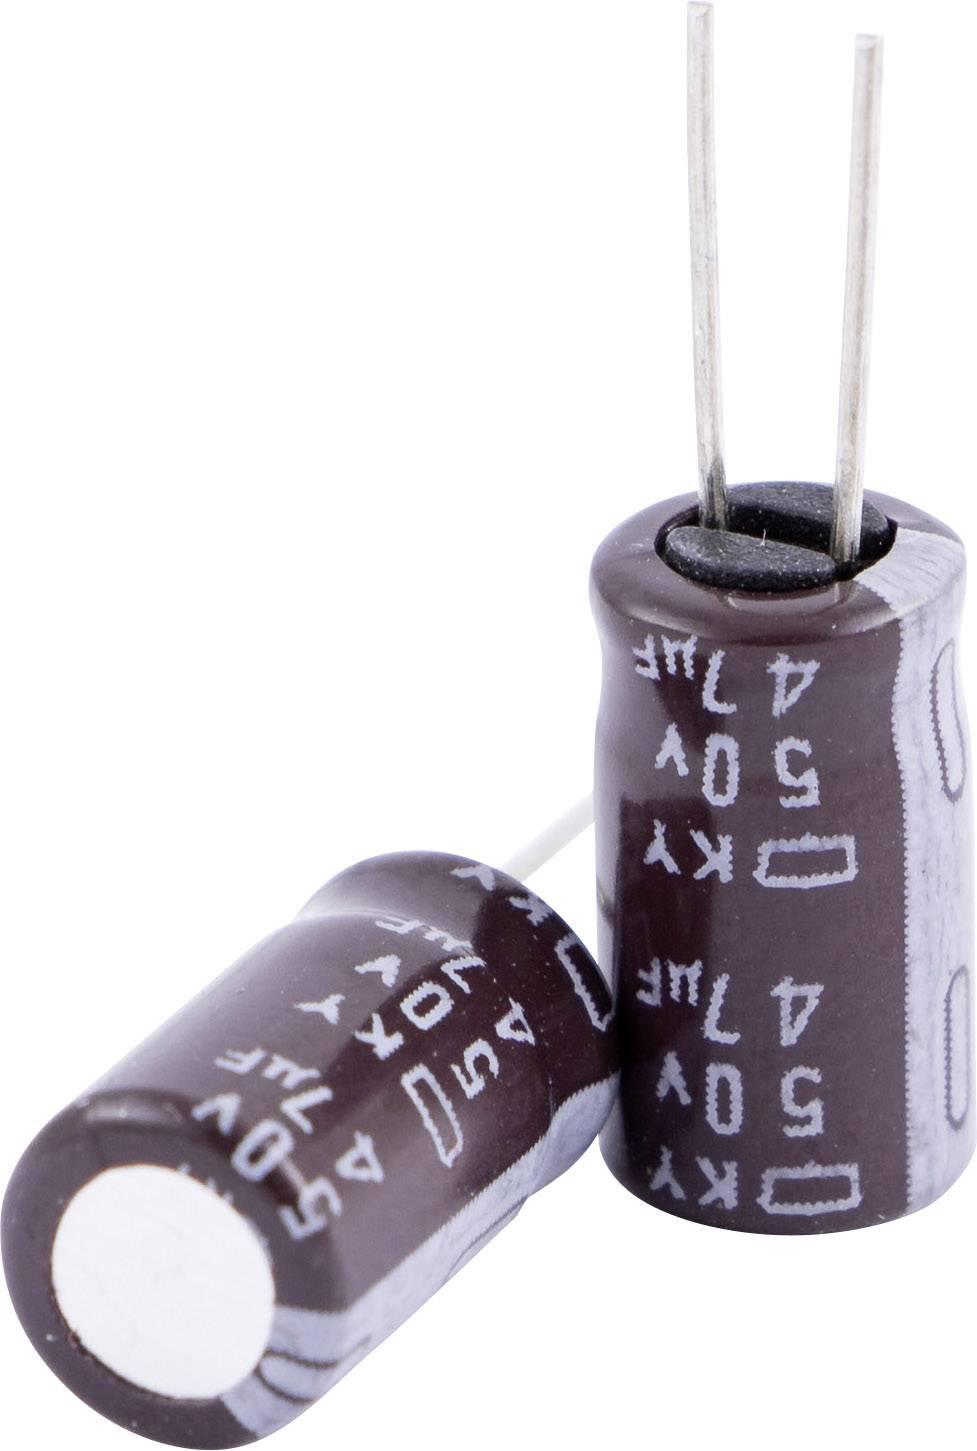 Yageo Elko Kondensator 150 µF 400V   25 x30 mm 105° ra.10mm 2 Stück